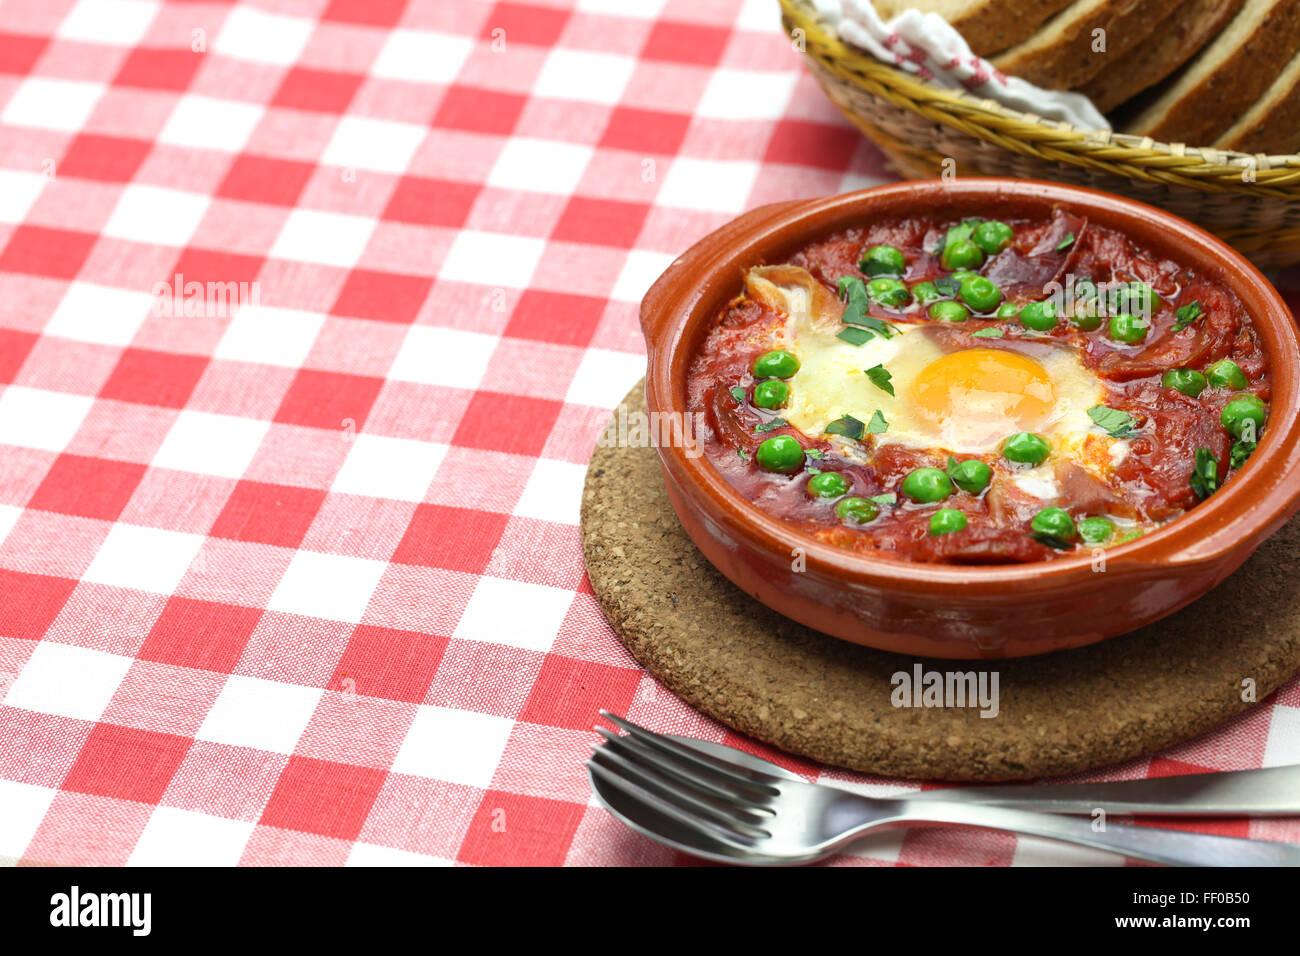 flamenco eggs, huevos a la flamenca, spanish andalusian cuisine - Stock Image